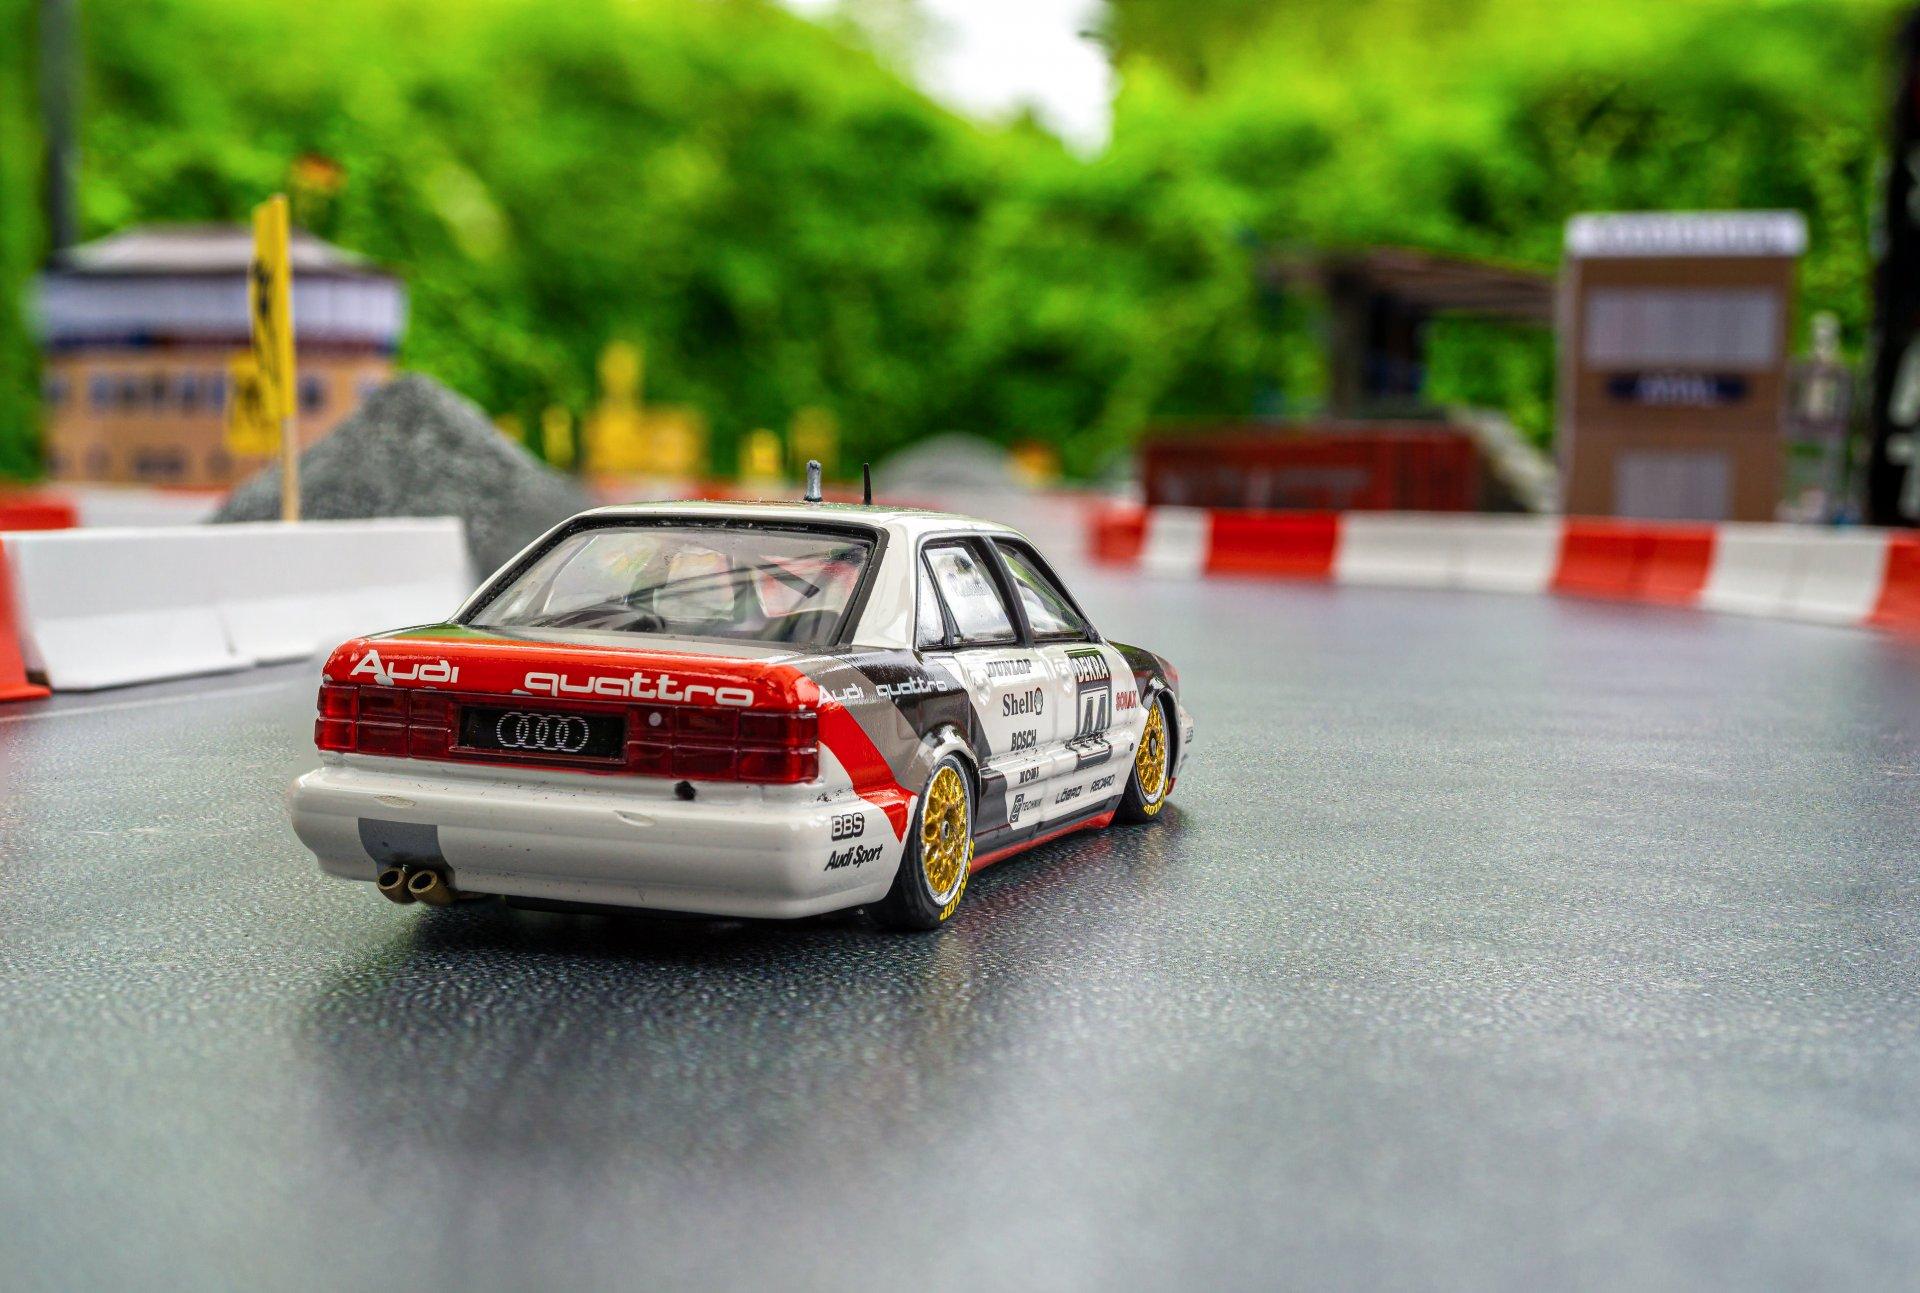 Audi Micha.jpg